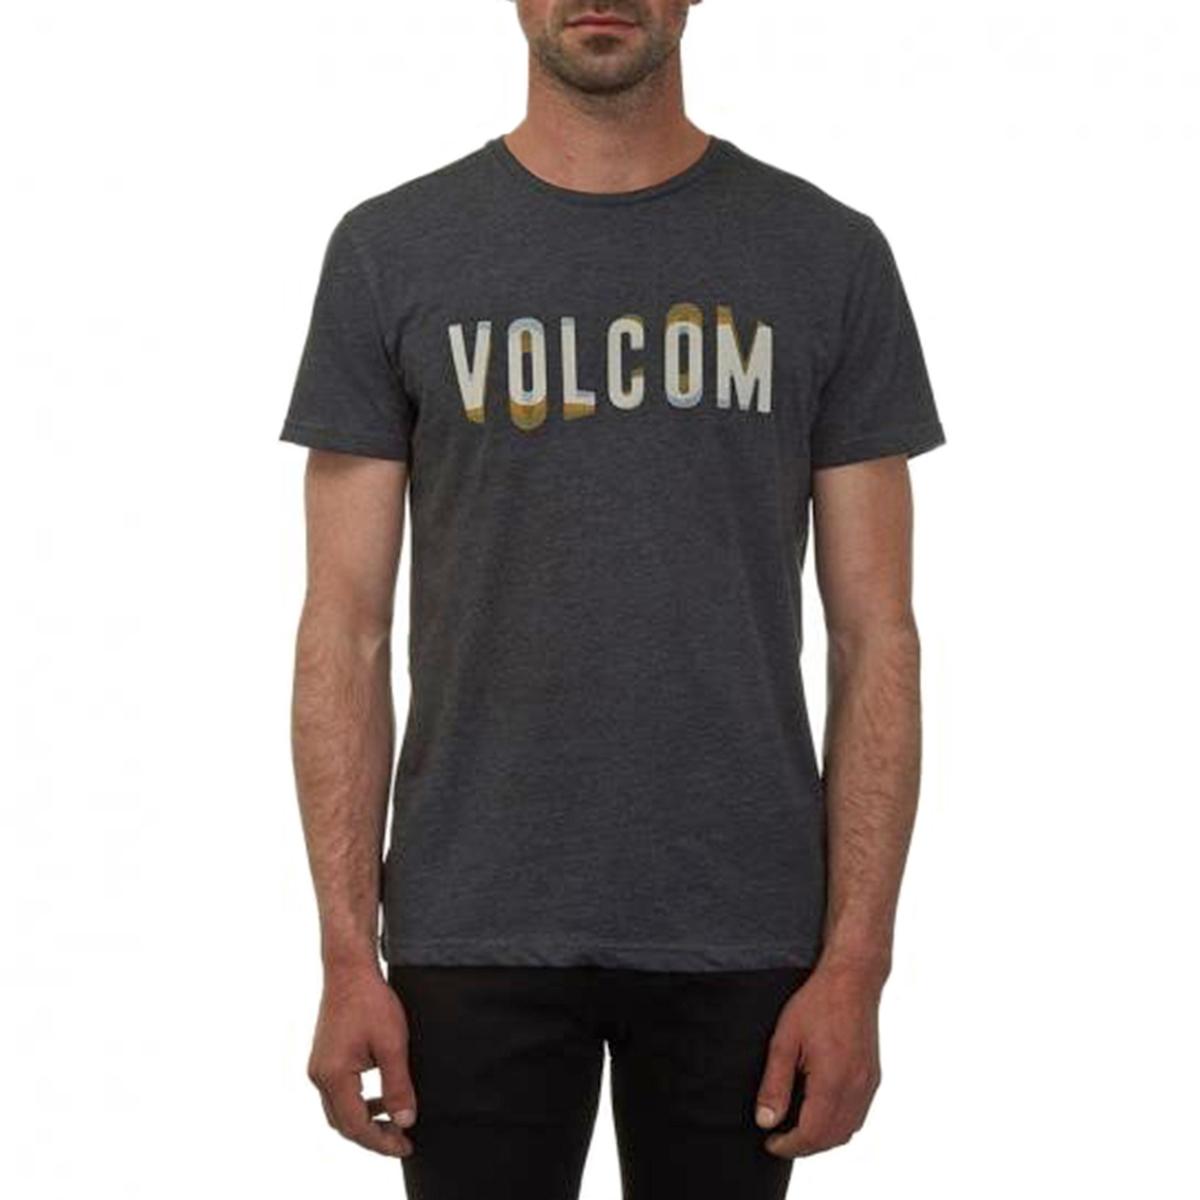 Футболка WARBLE от VOLCOM футболка ghost от volcom